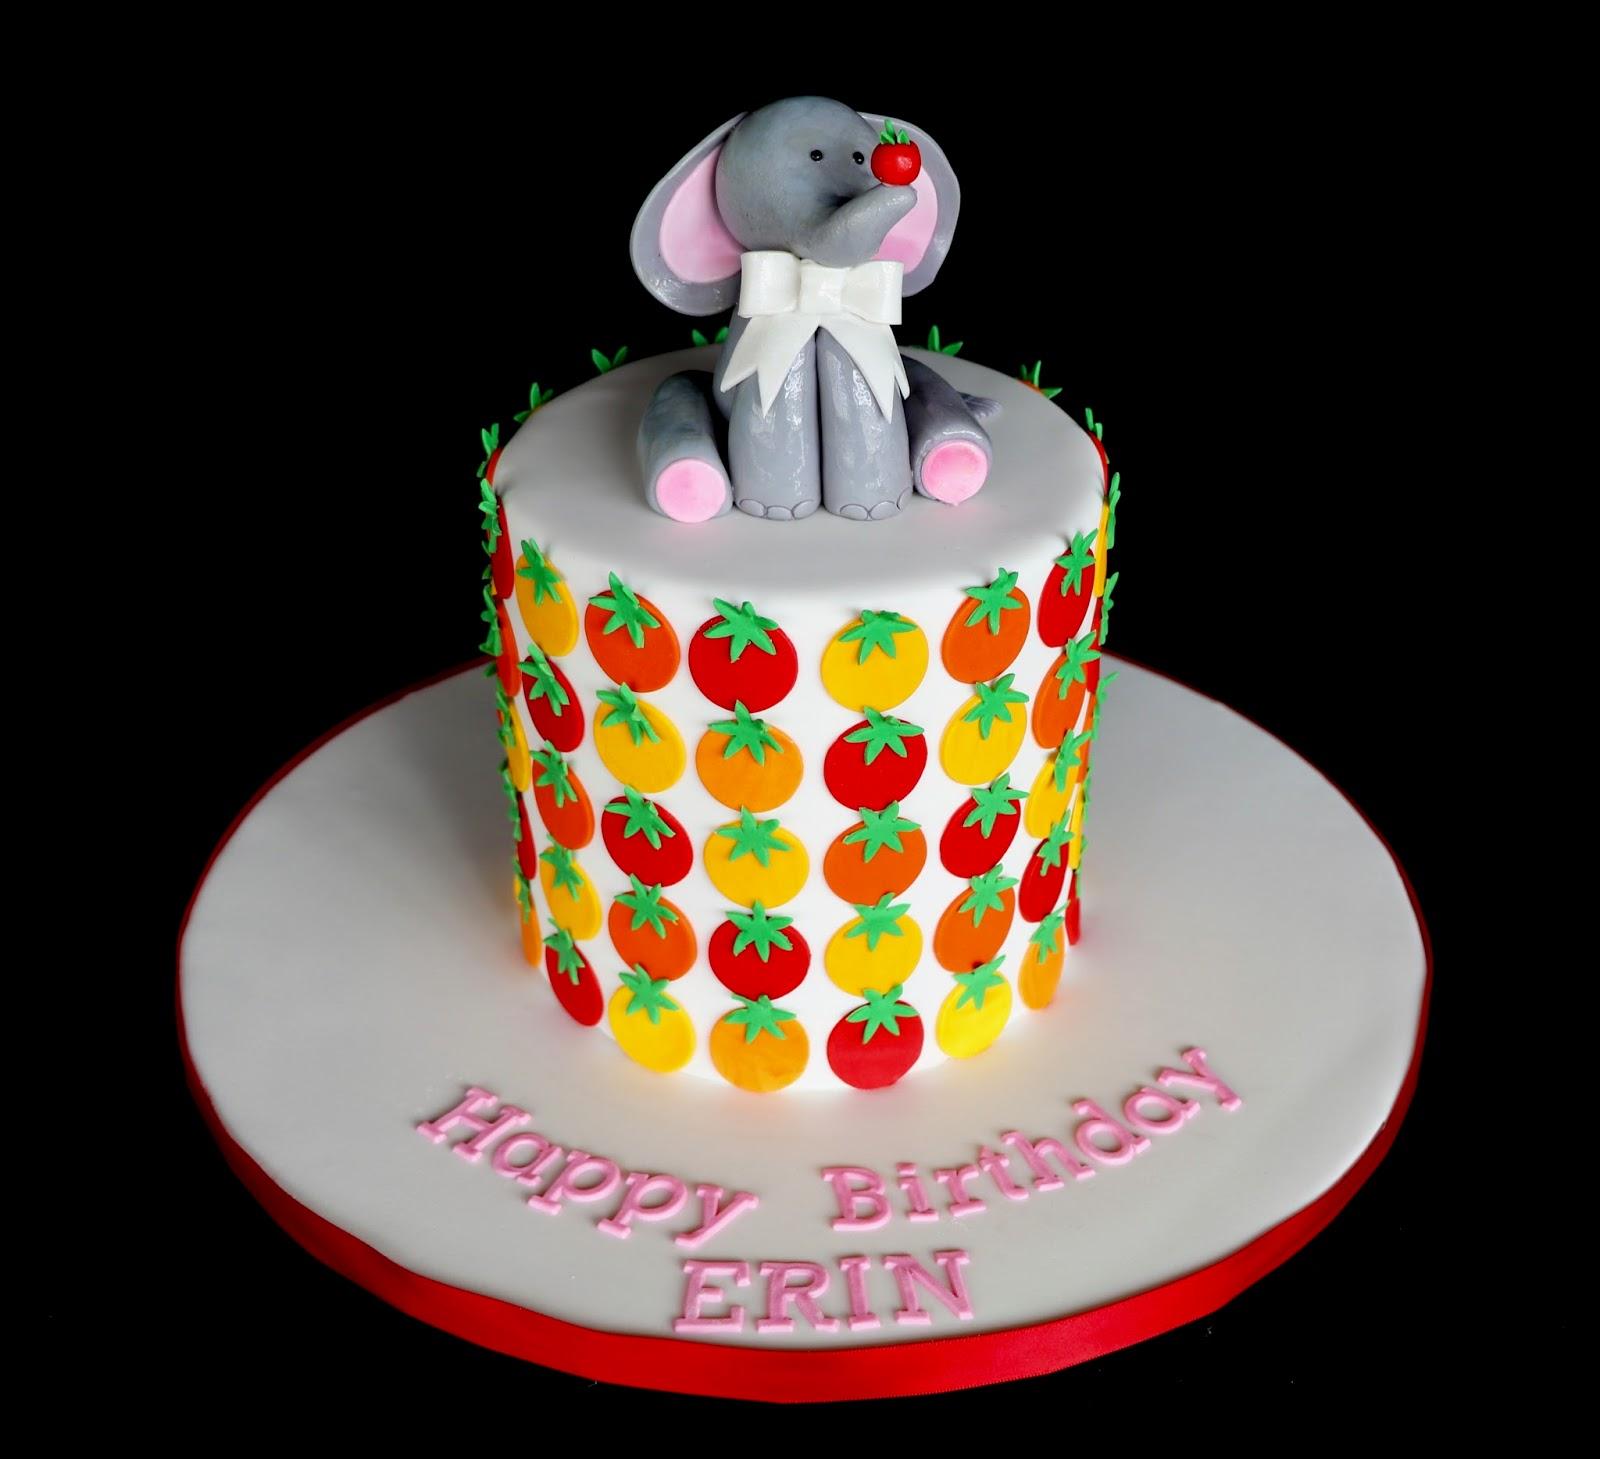 Baking Maniac 1st Birthday Cherry Tomato Cake